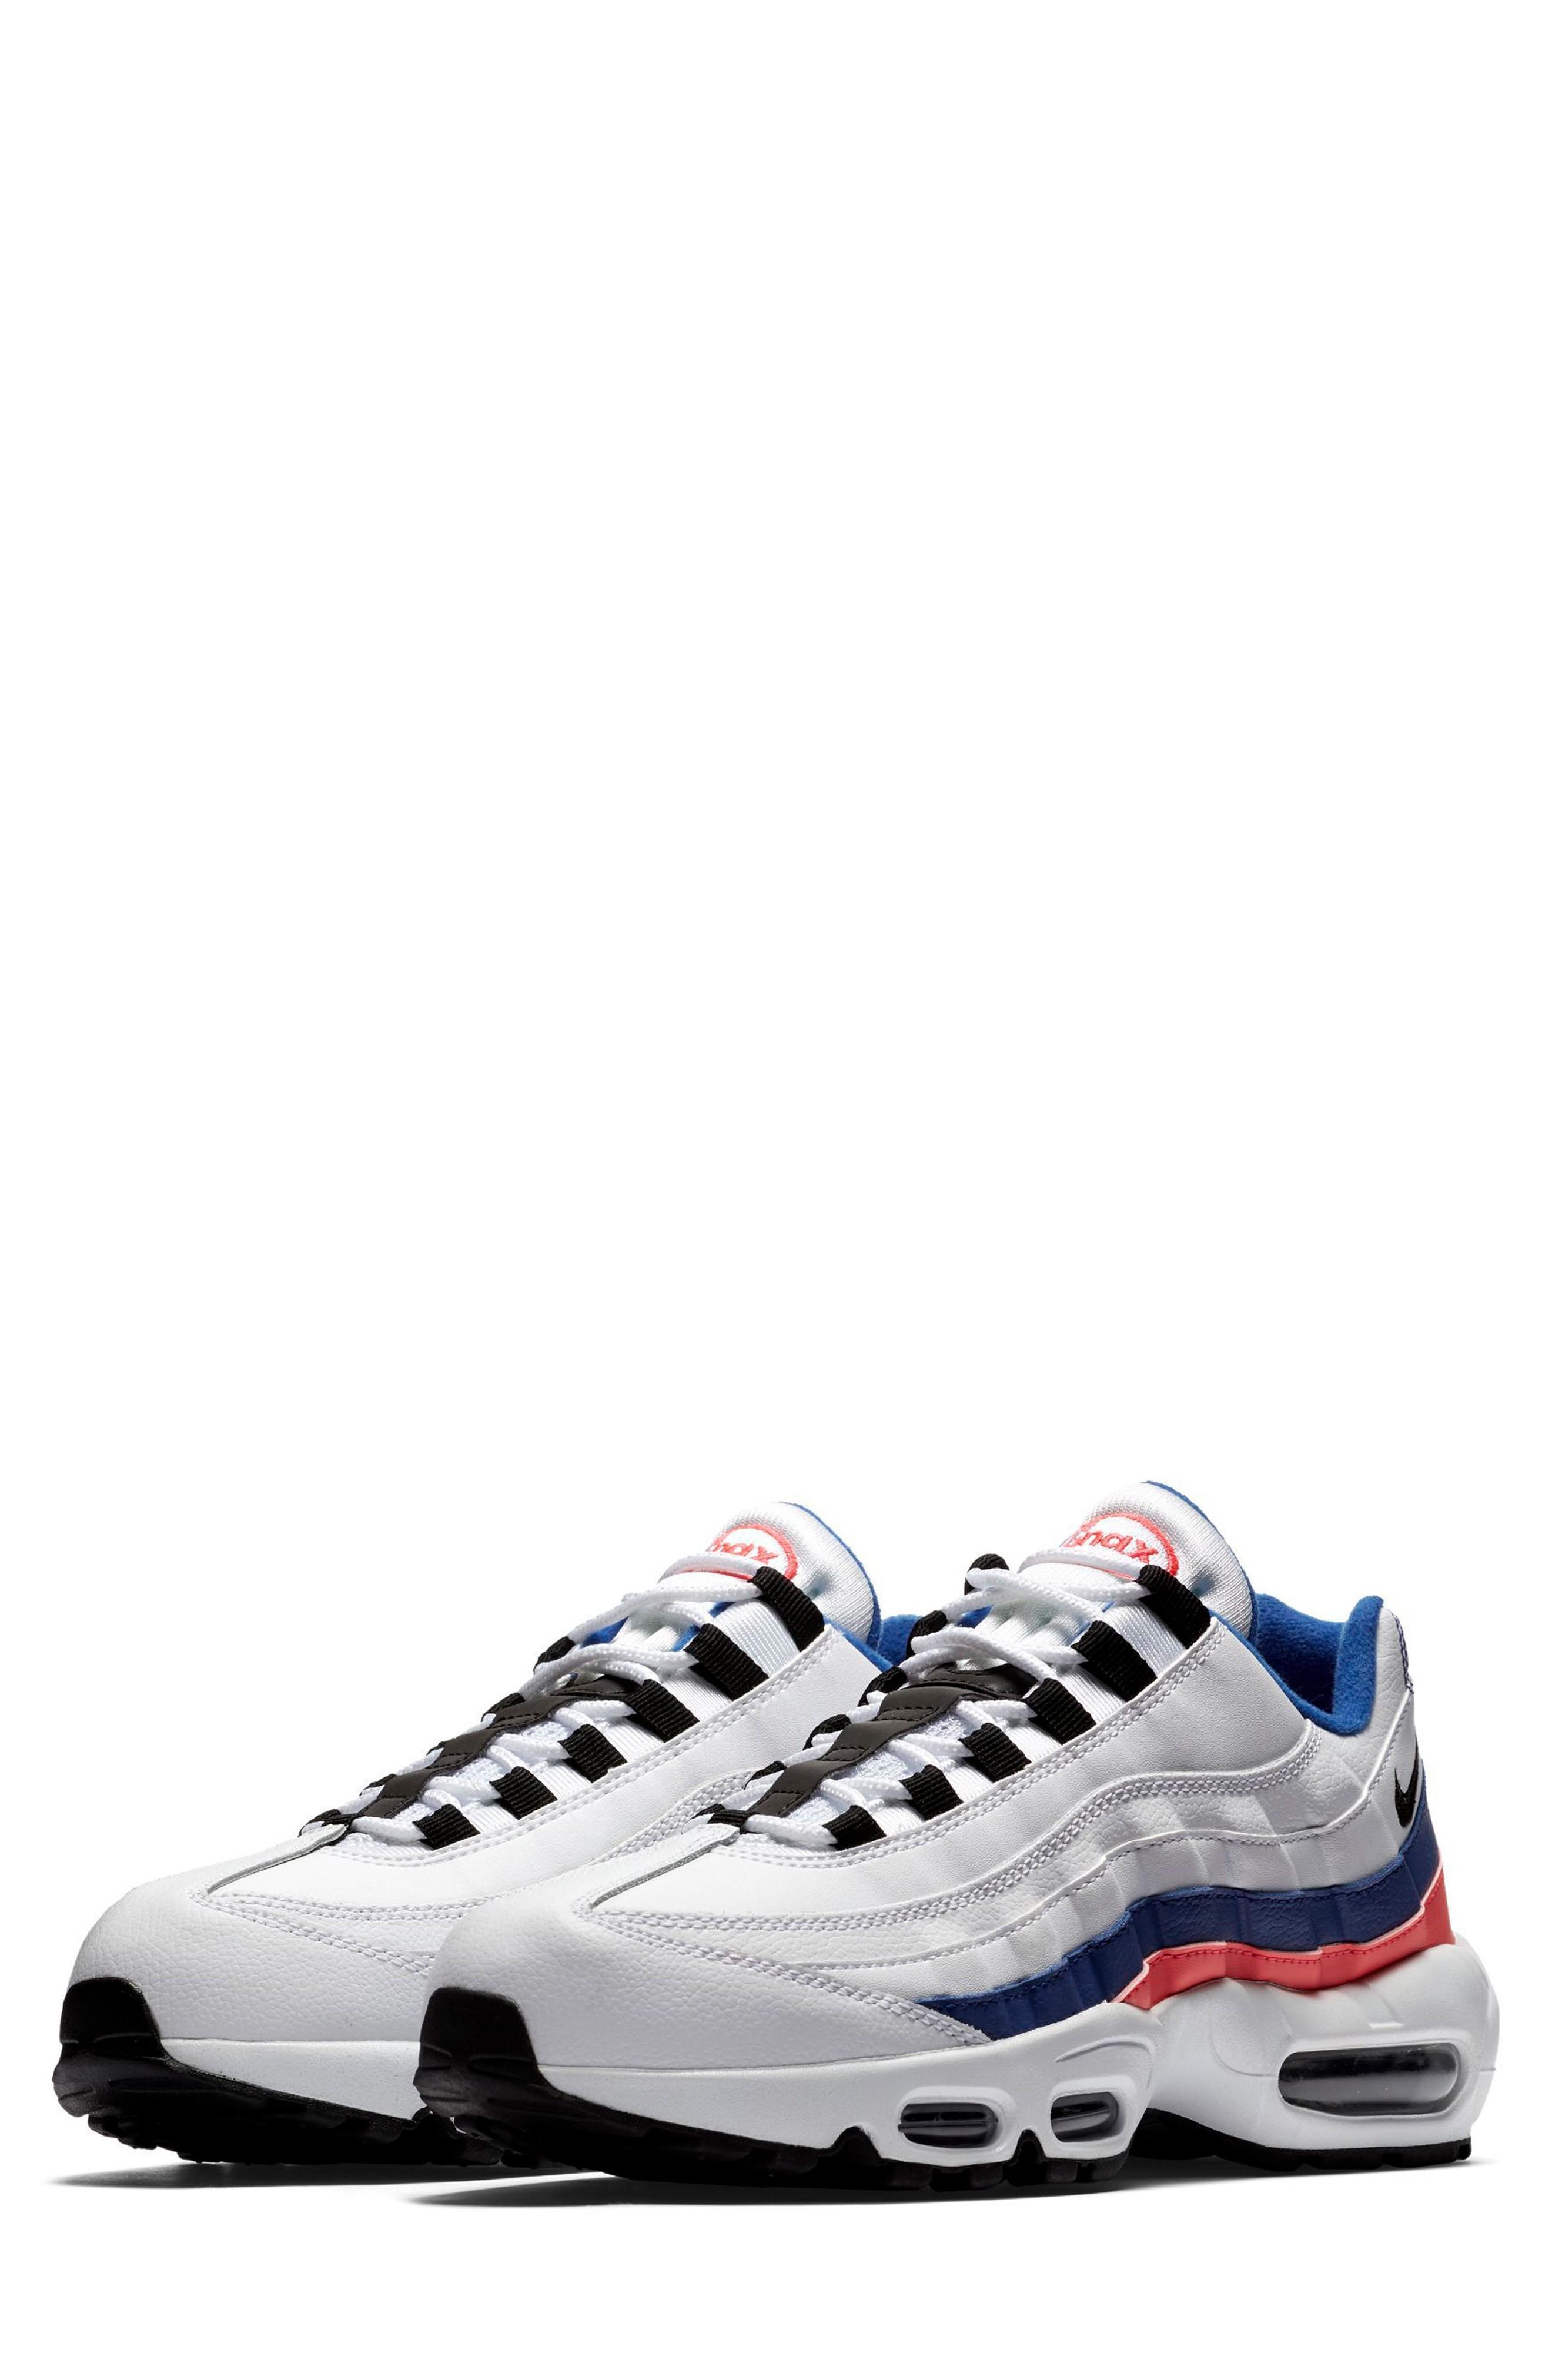 best service 612e2 cef51 Men's Air Max 95 Essential Running Shoes, White